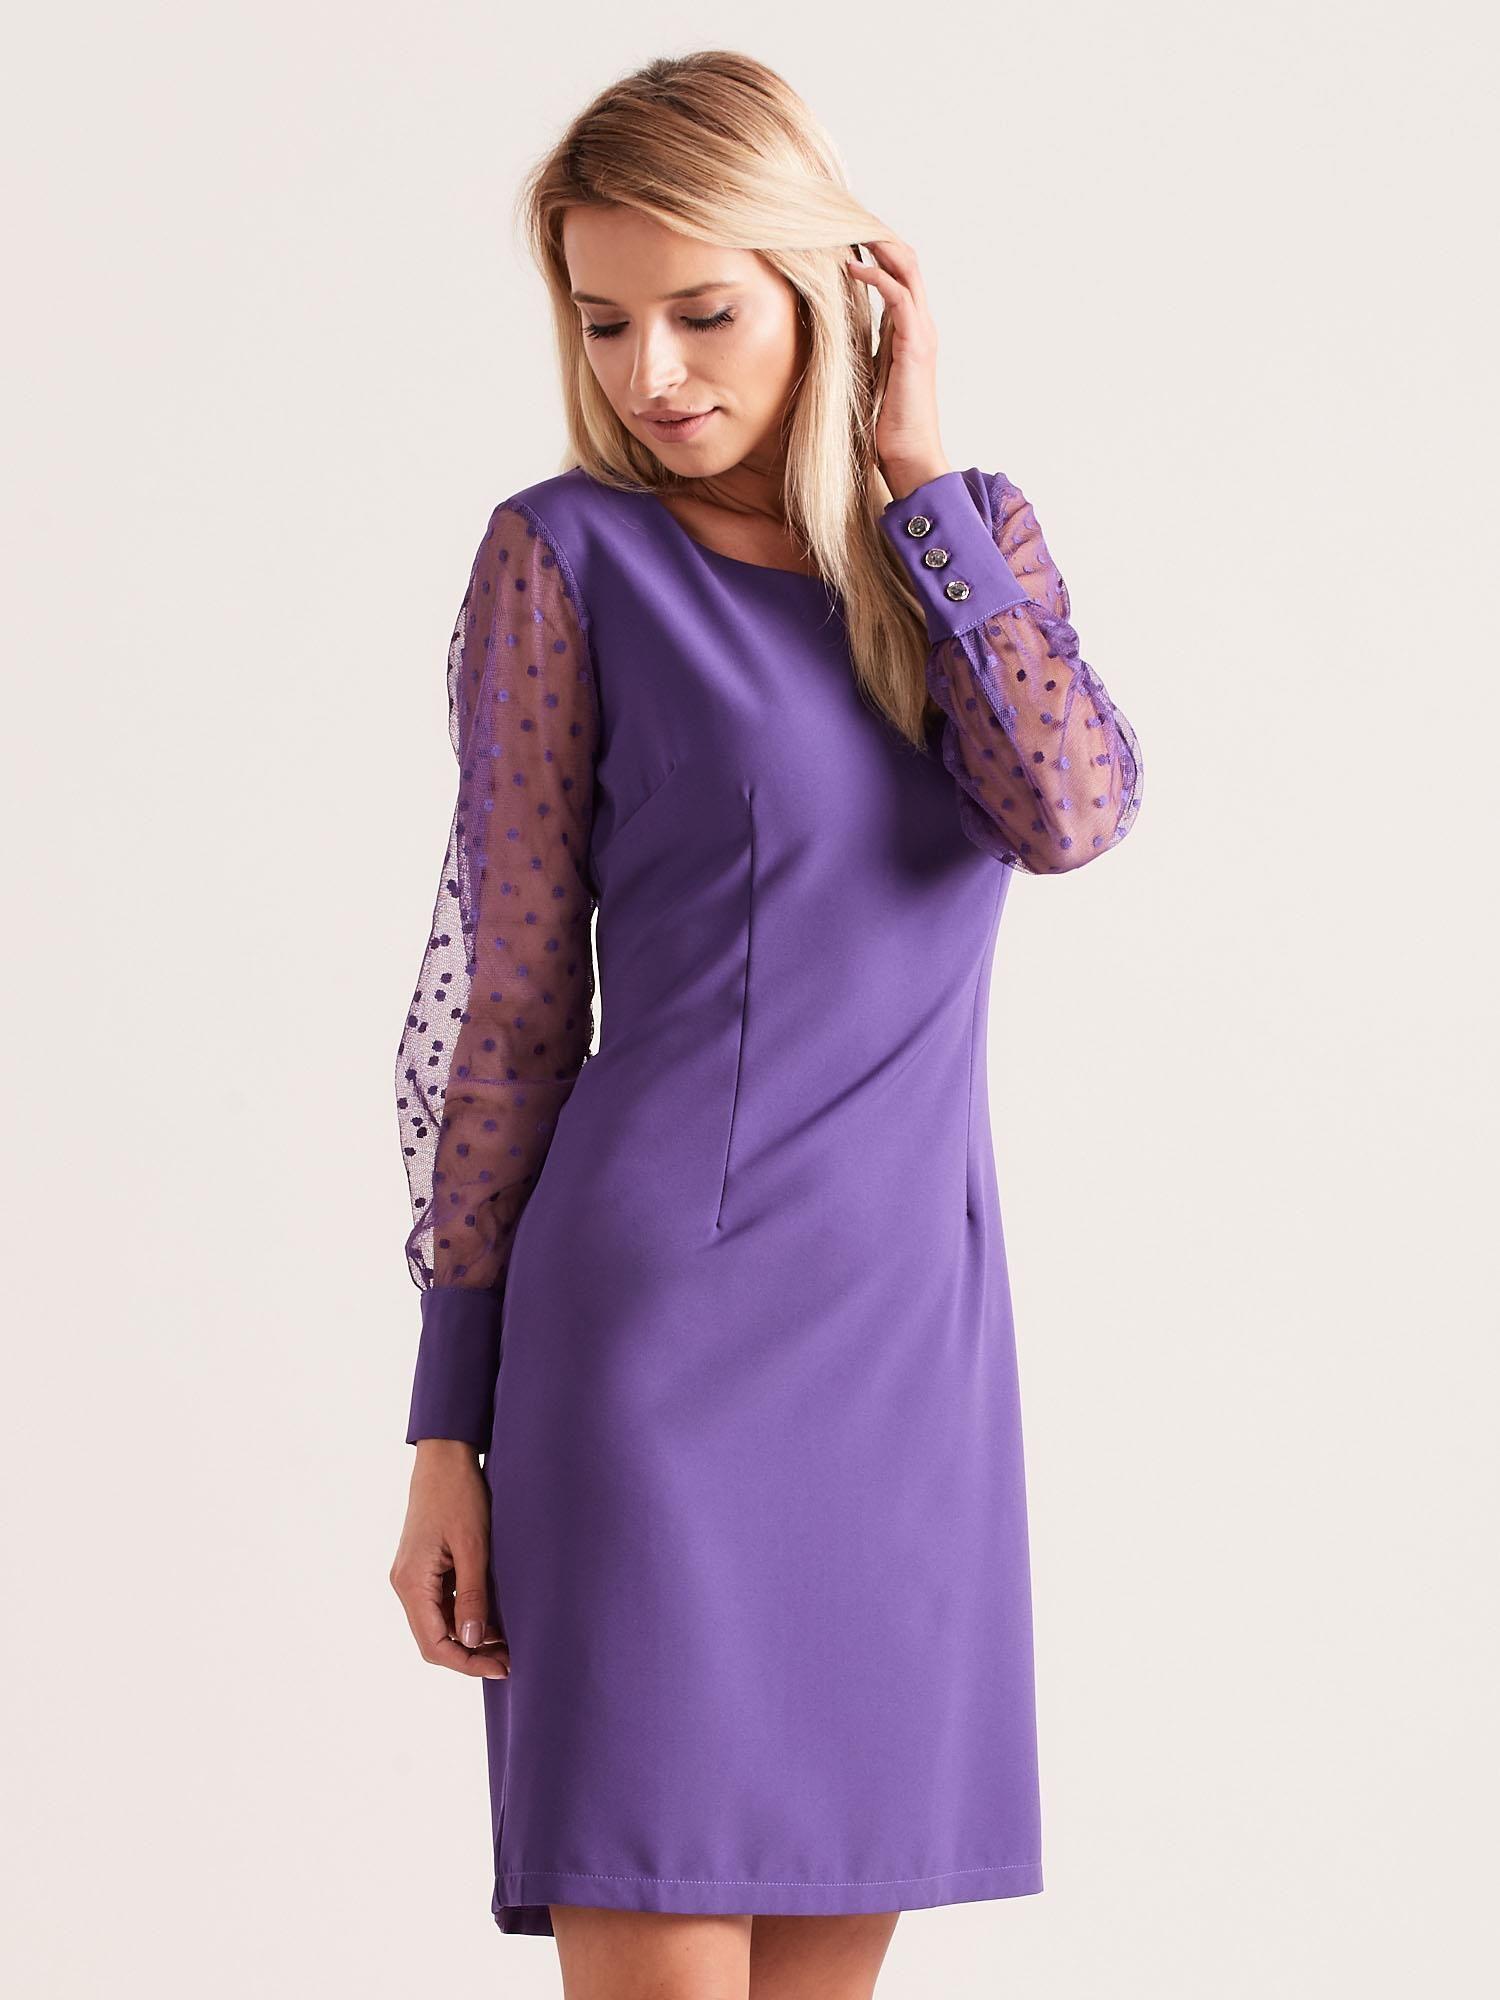 b83f7f54 Fioletowa sukienka z mankietami